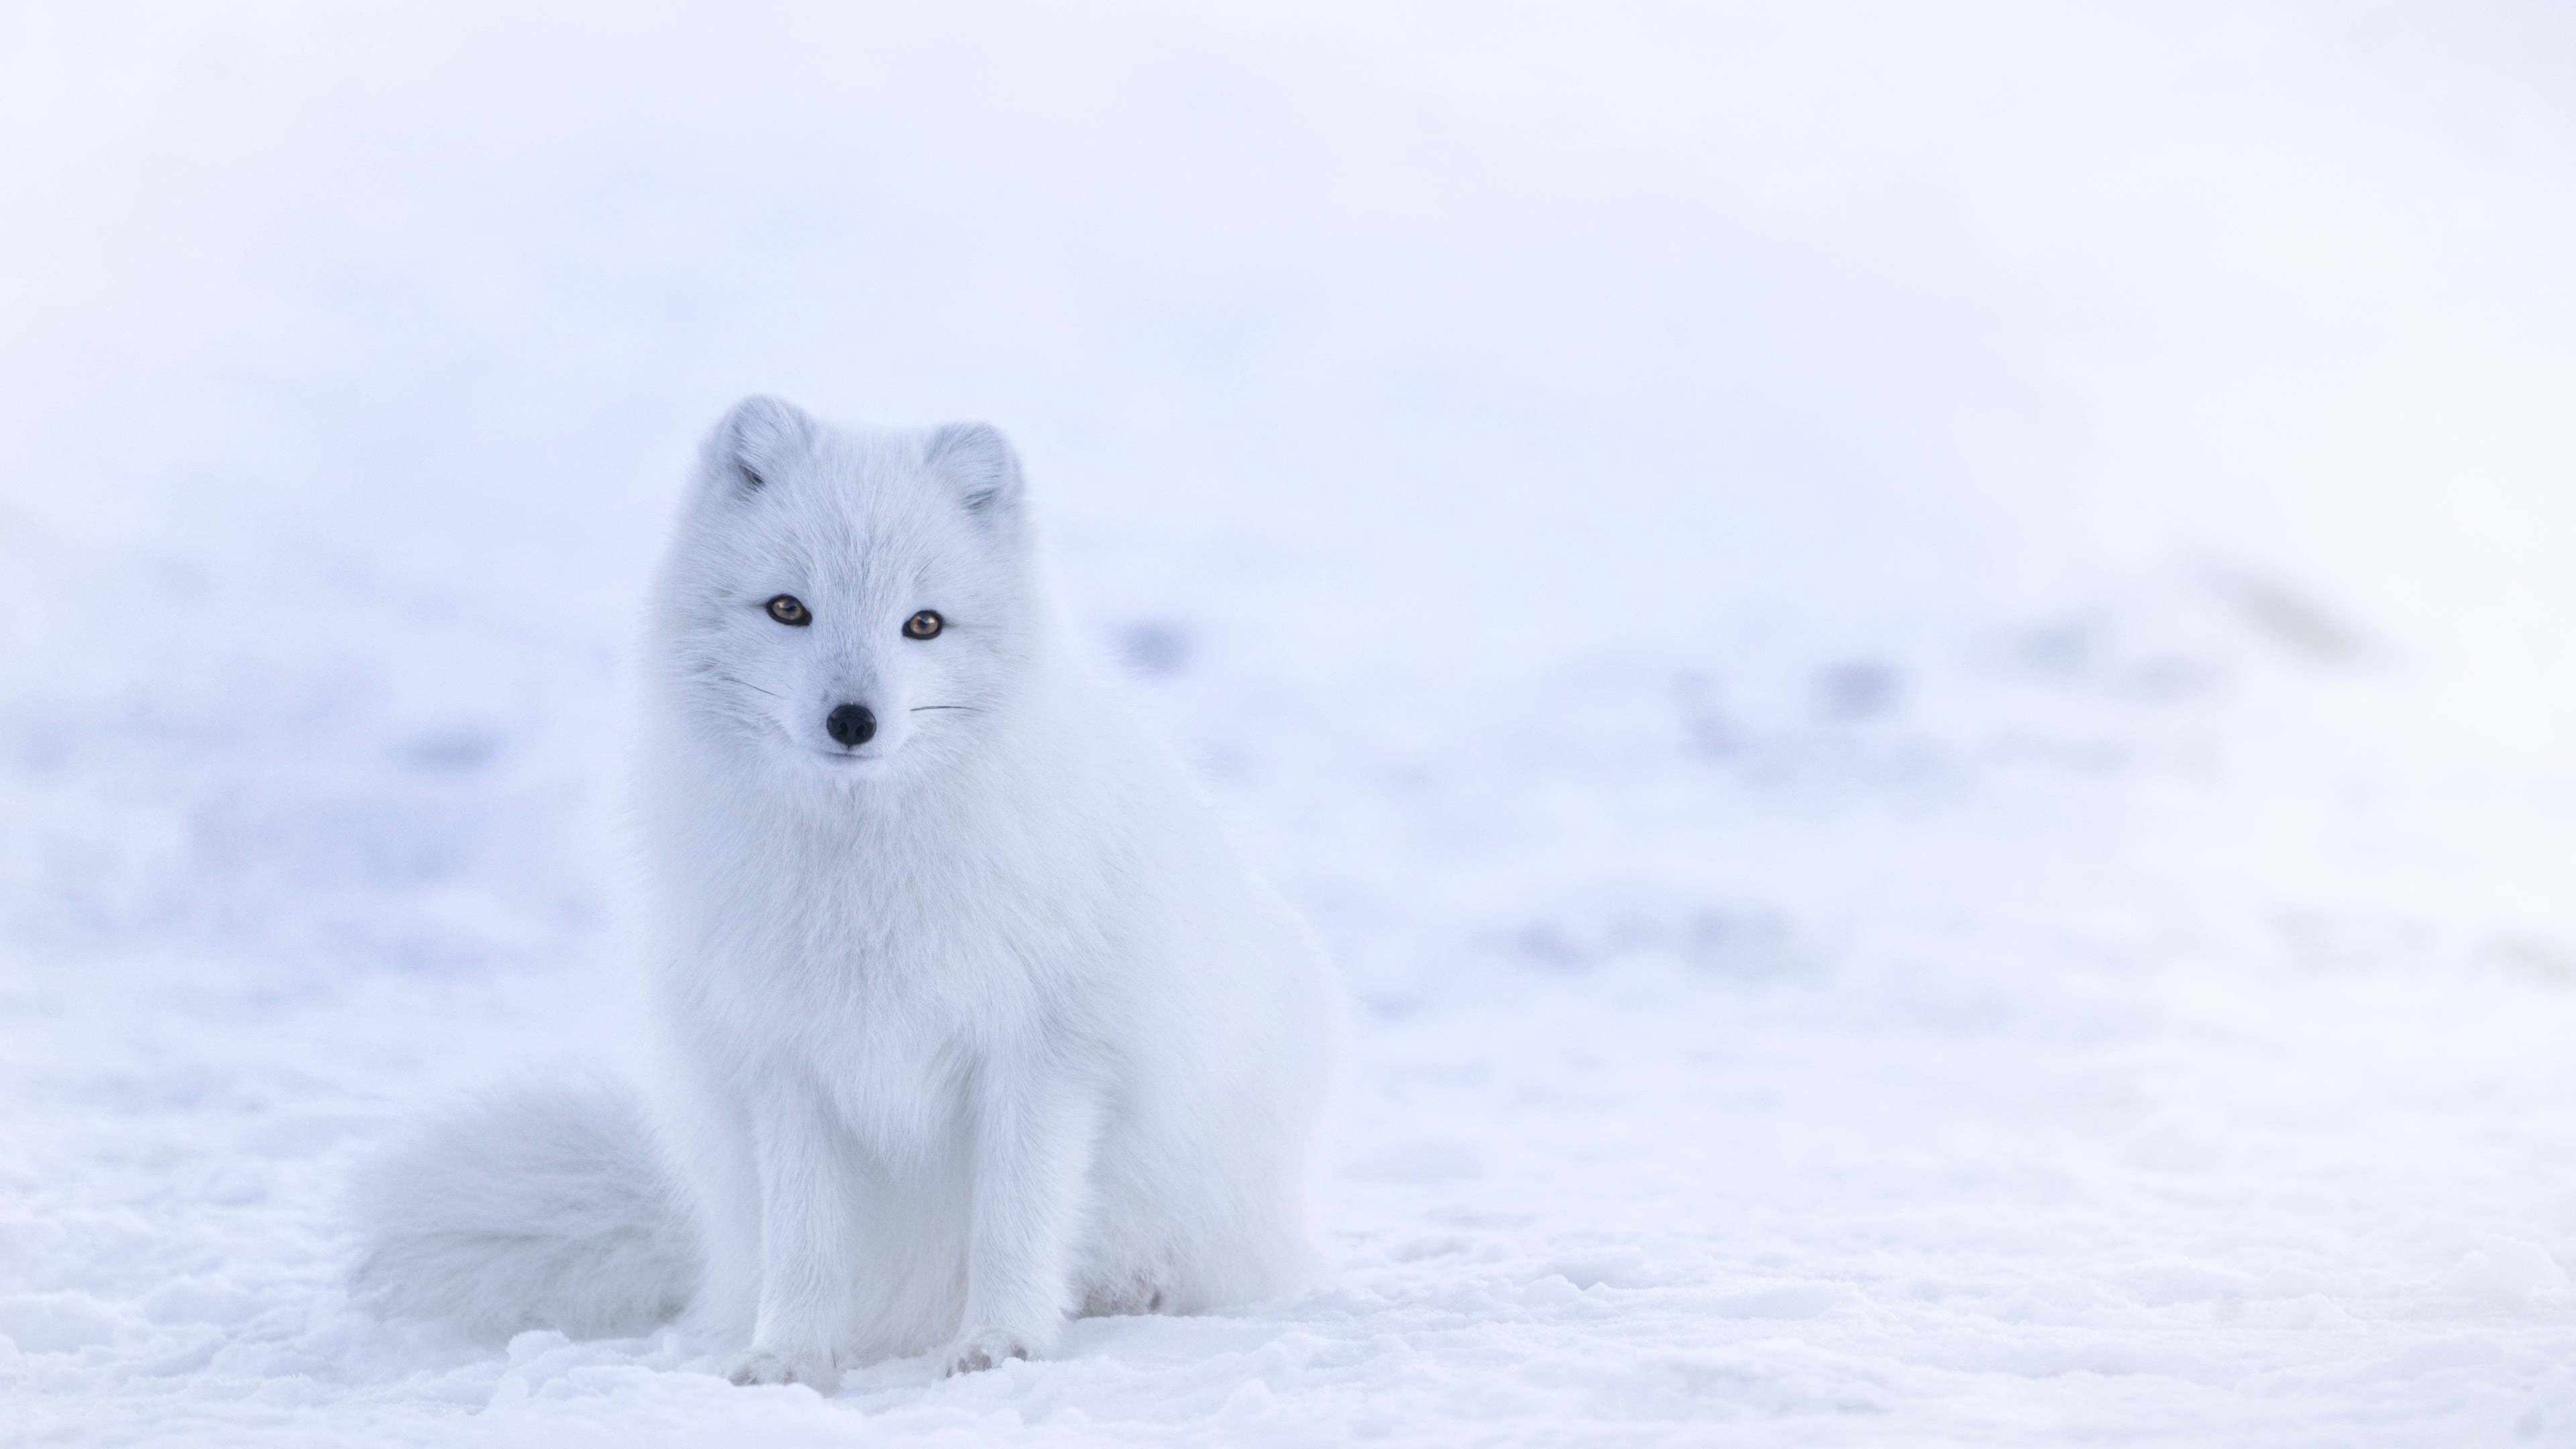 arctic fox iceland uhd 4k wallpaper